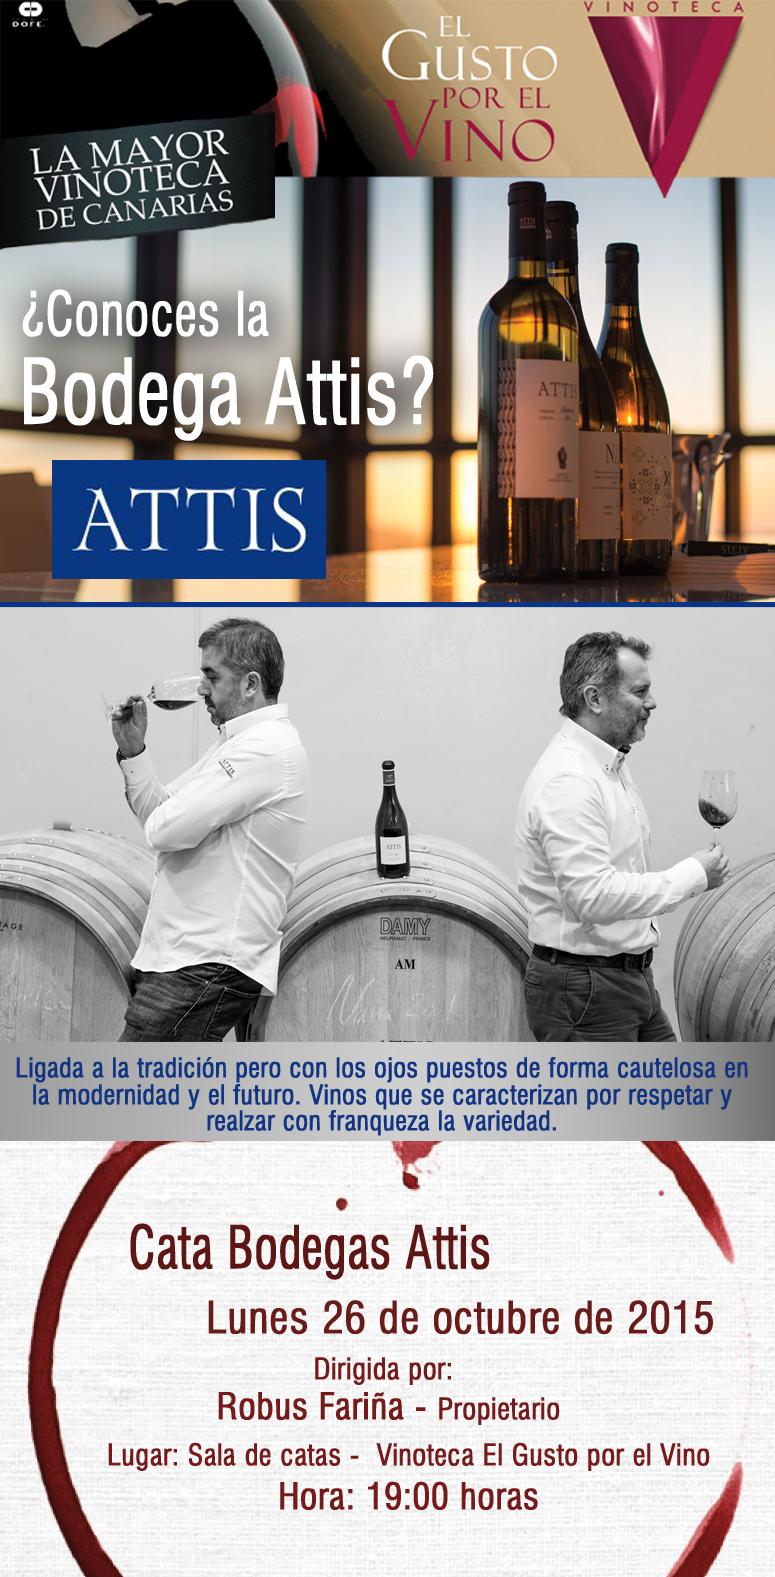 ATTIS, en la vinoteca El Gusto por el Vino